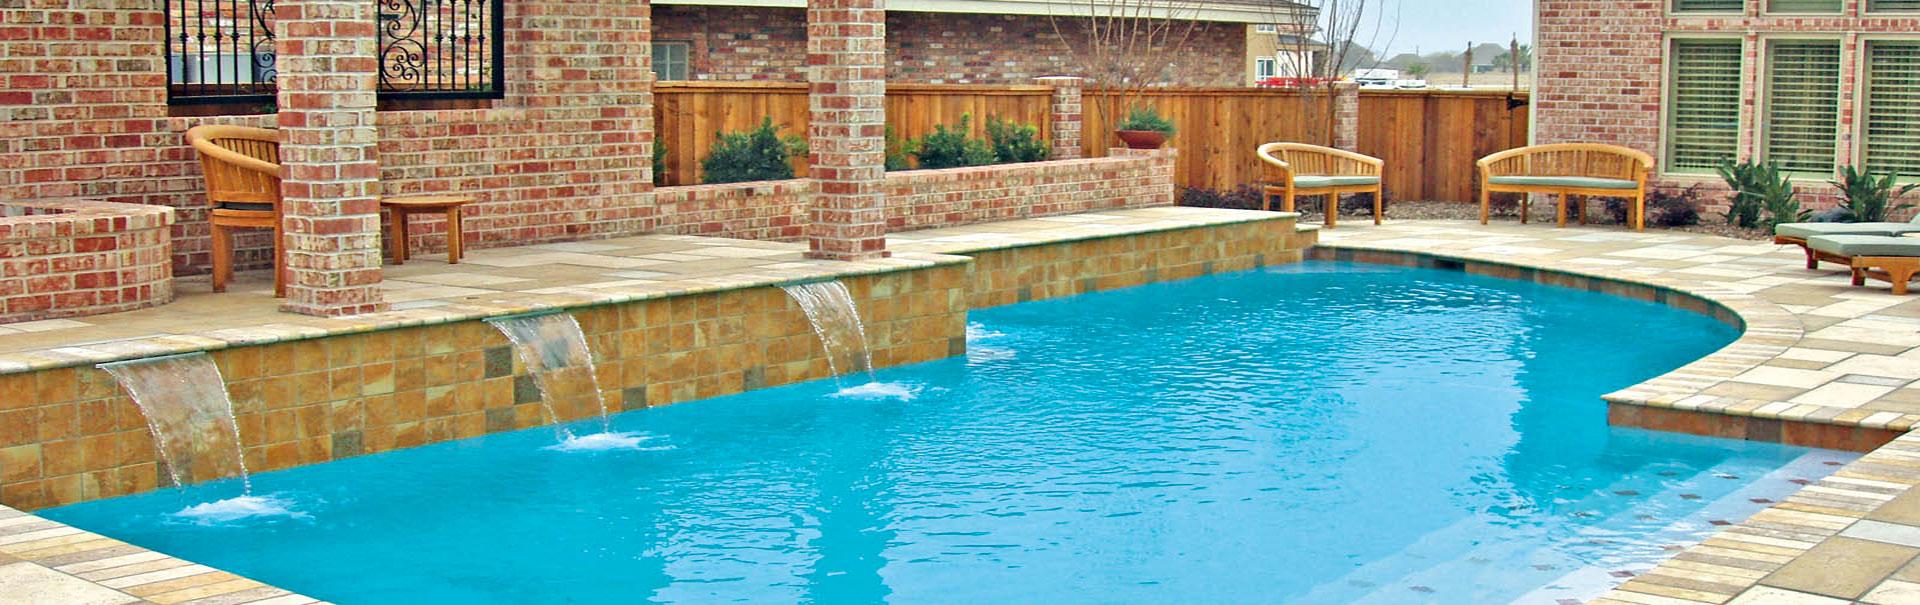 Corpus-Christi-Swimming-Pool